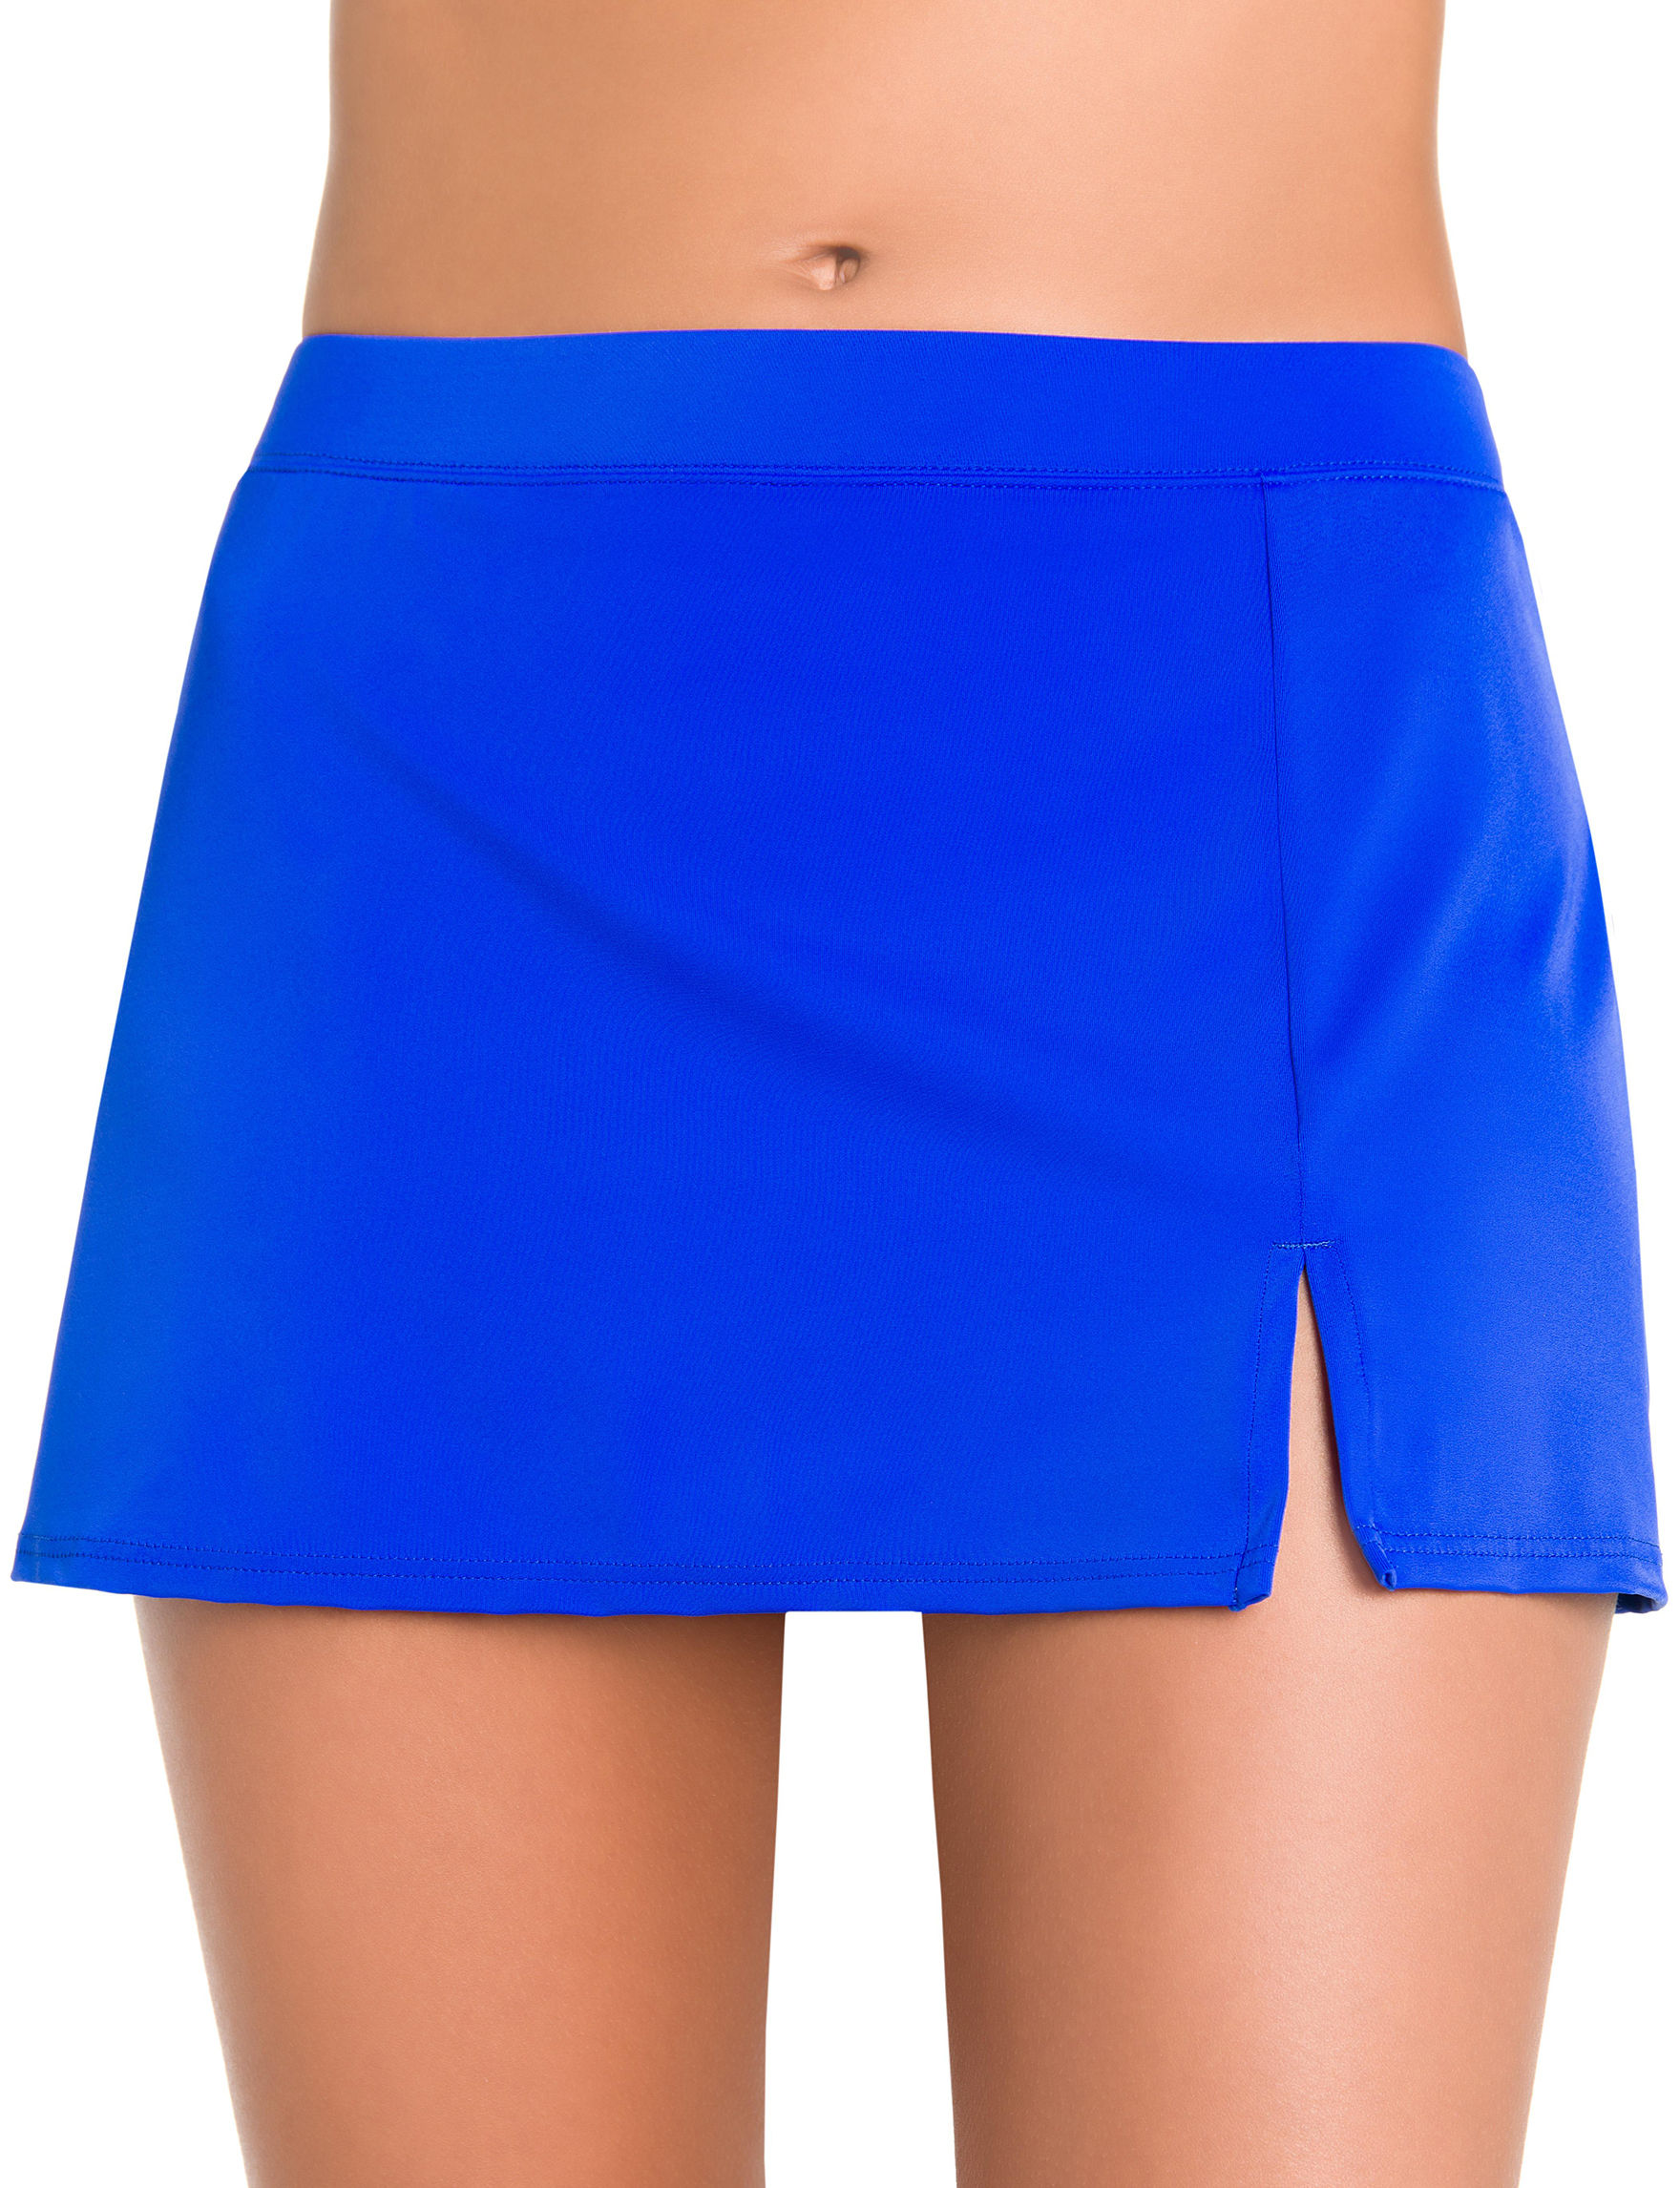 Caribbean Joe Sapphire Swimsuit Bottoms Skirtini